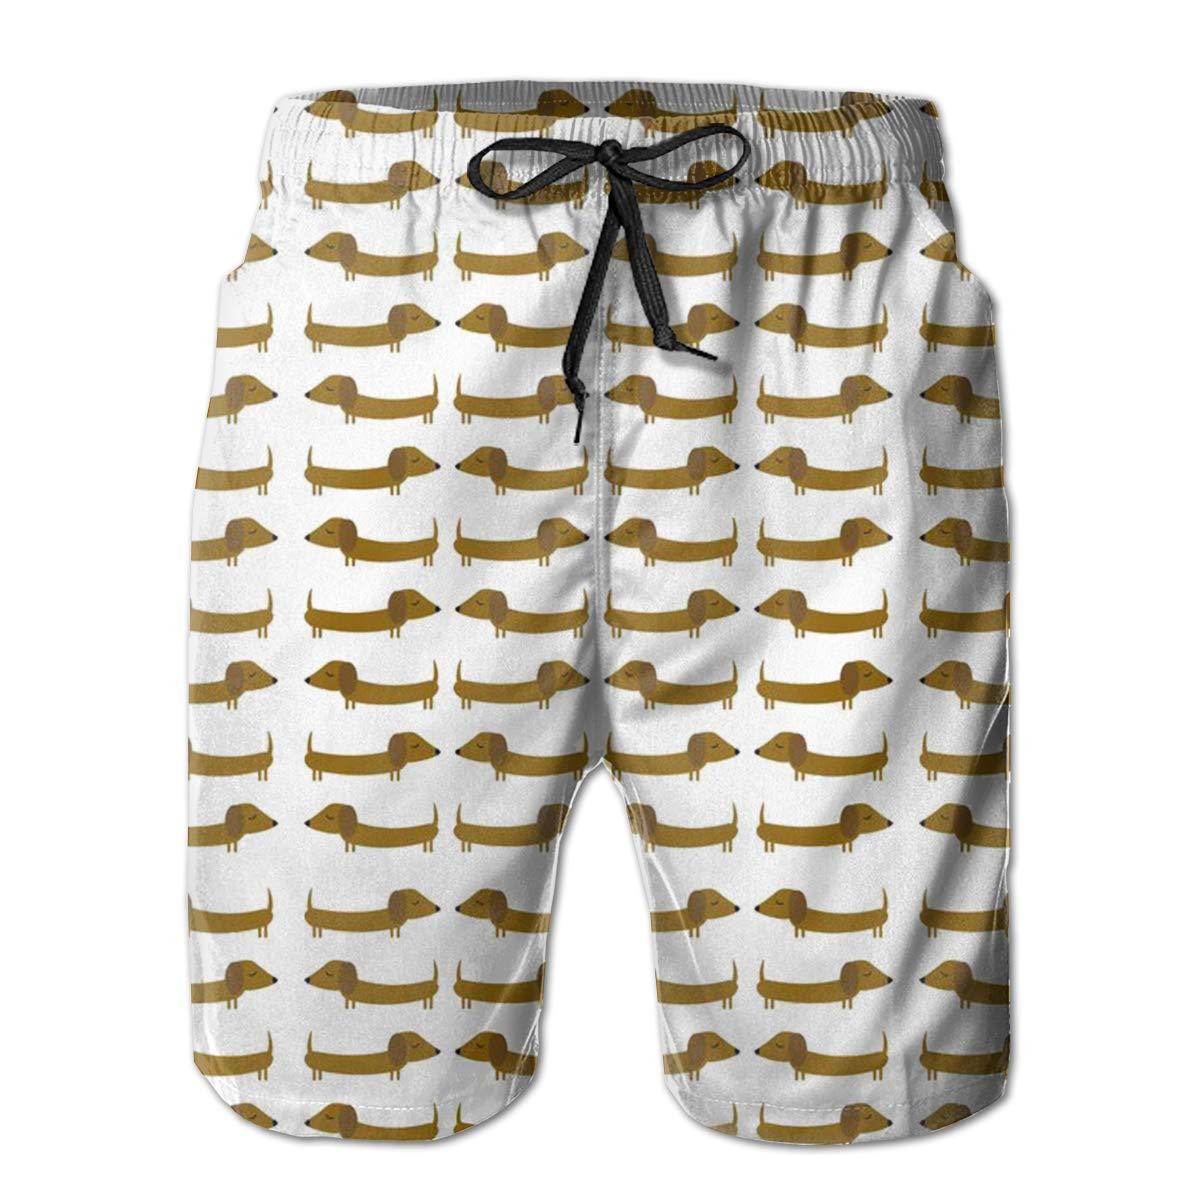 DHVJBC Mens Dachshund Dog Summer Holiday Quick-Drying Swim Trunks Beach Shorts Board Shorts